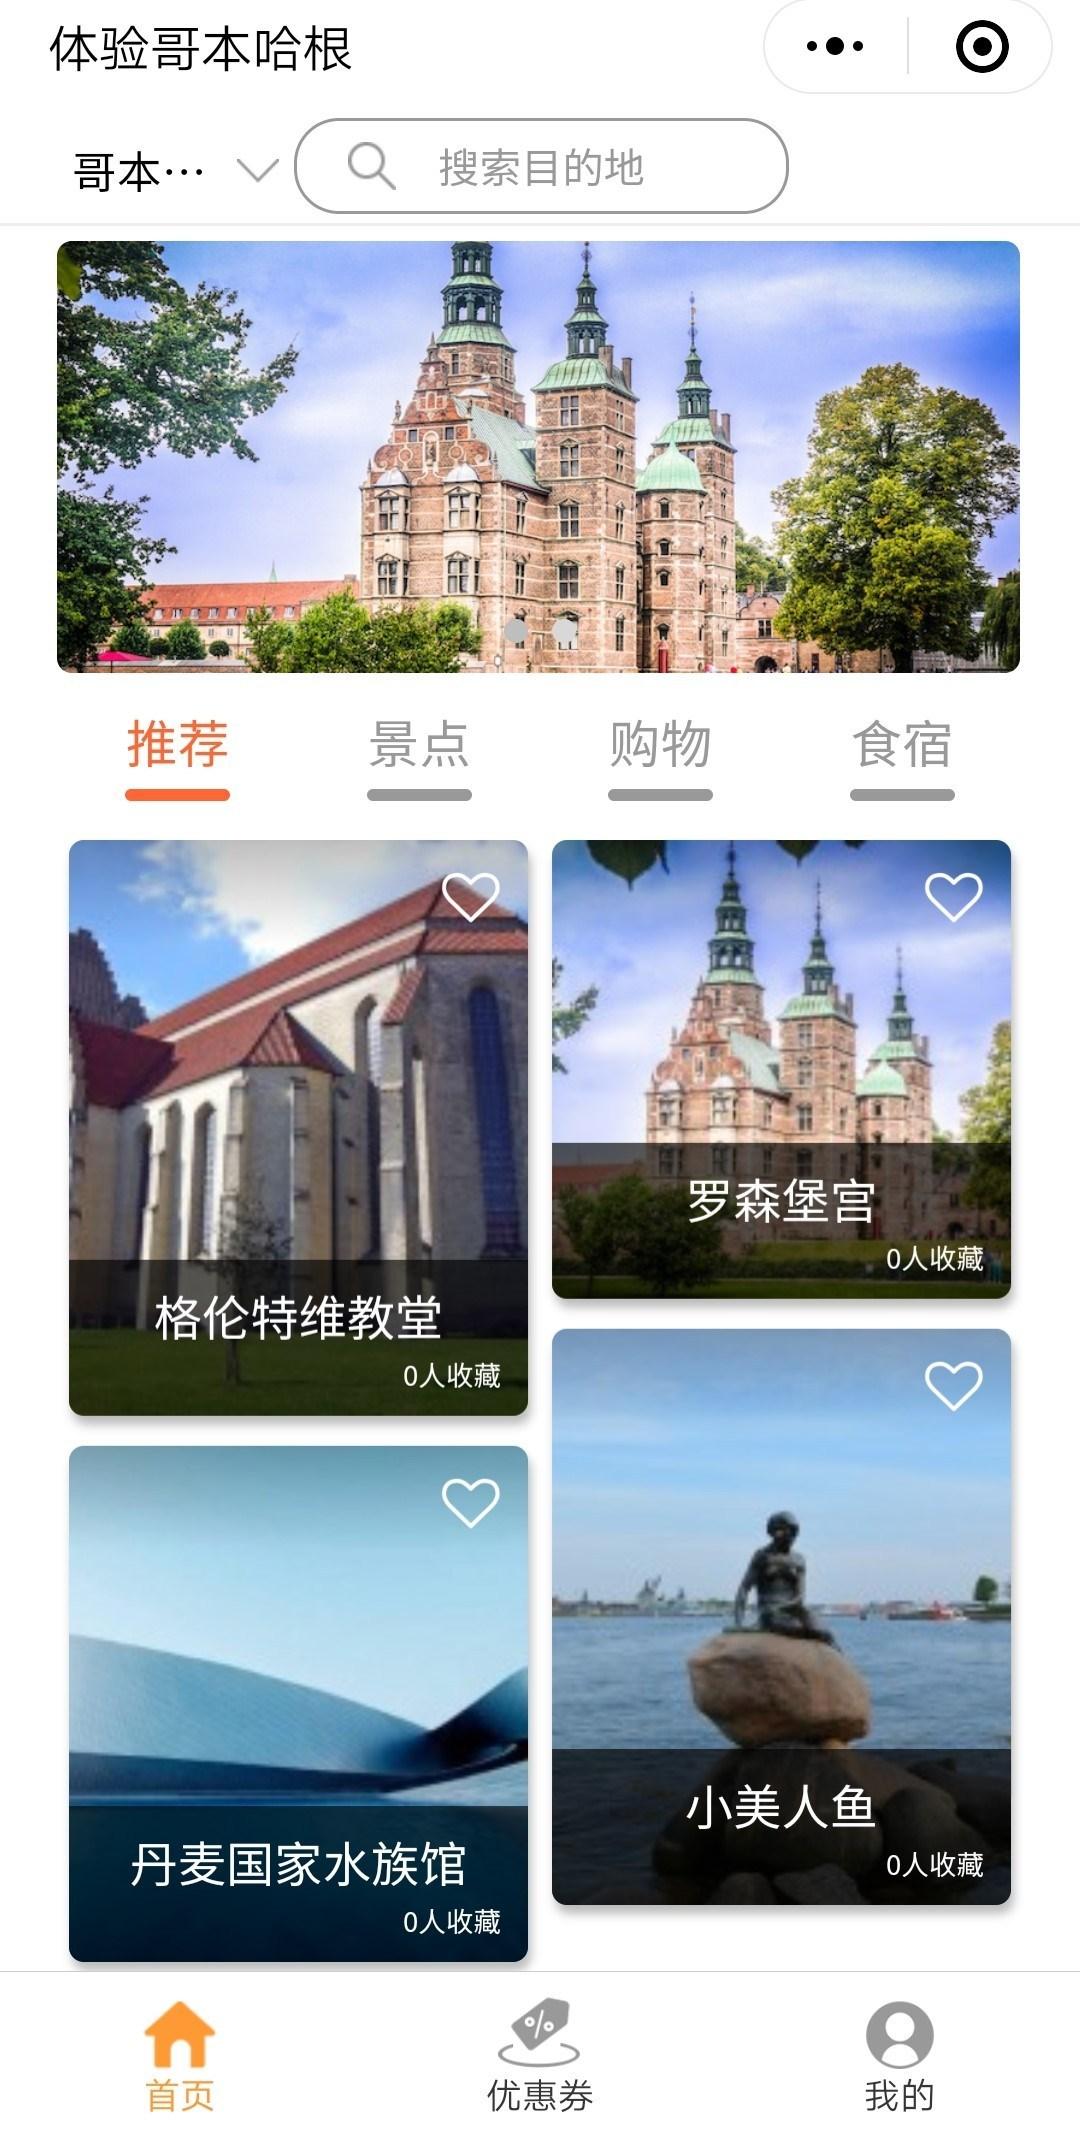 China-based tourism Wechat mini-program - EuroPass